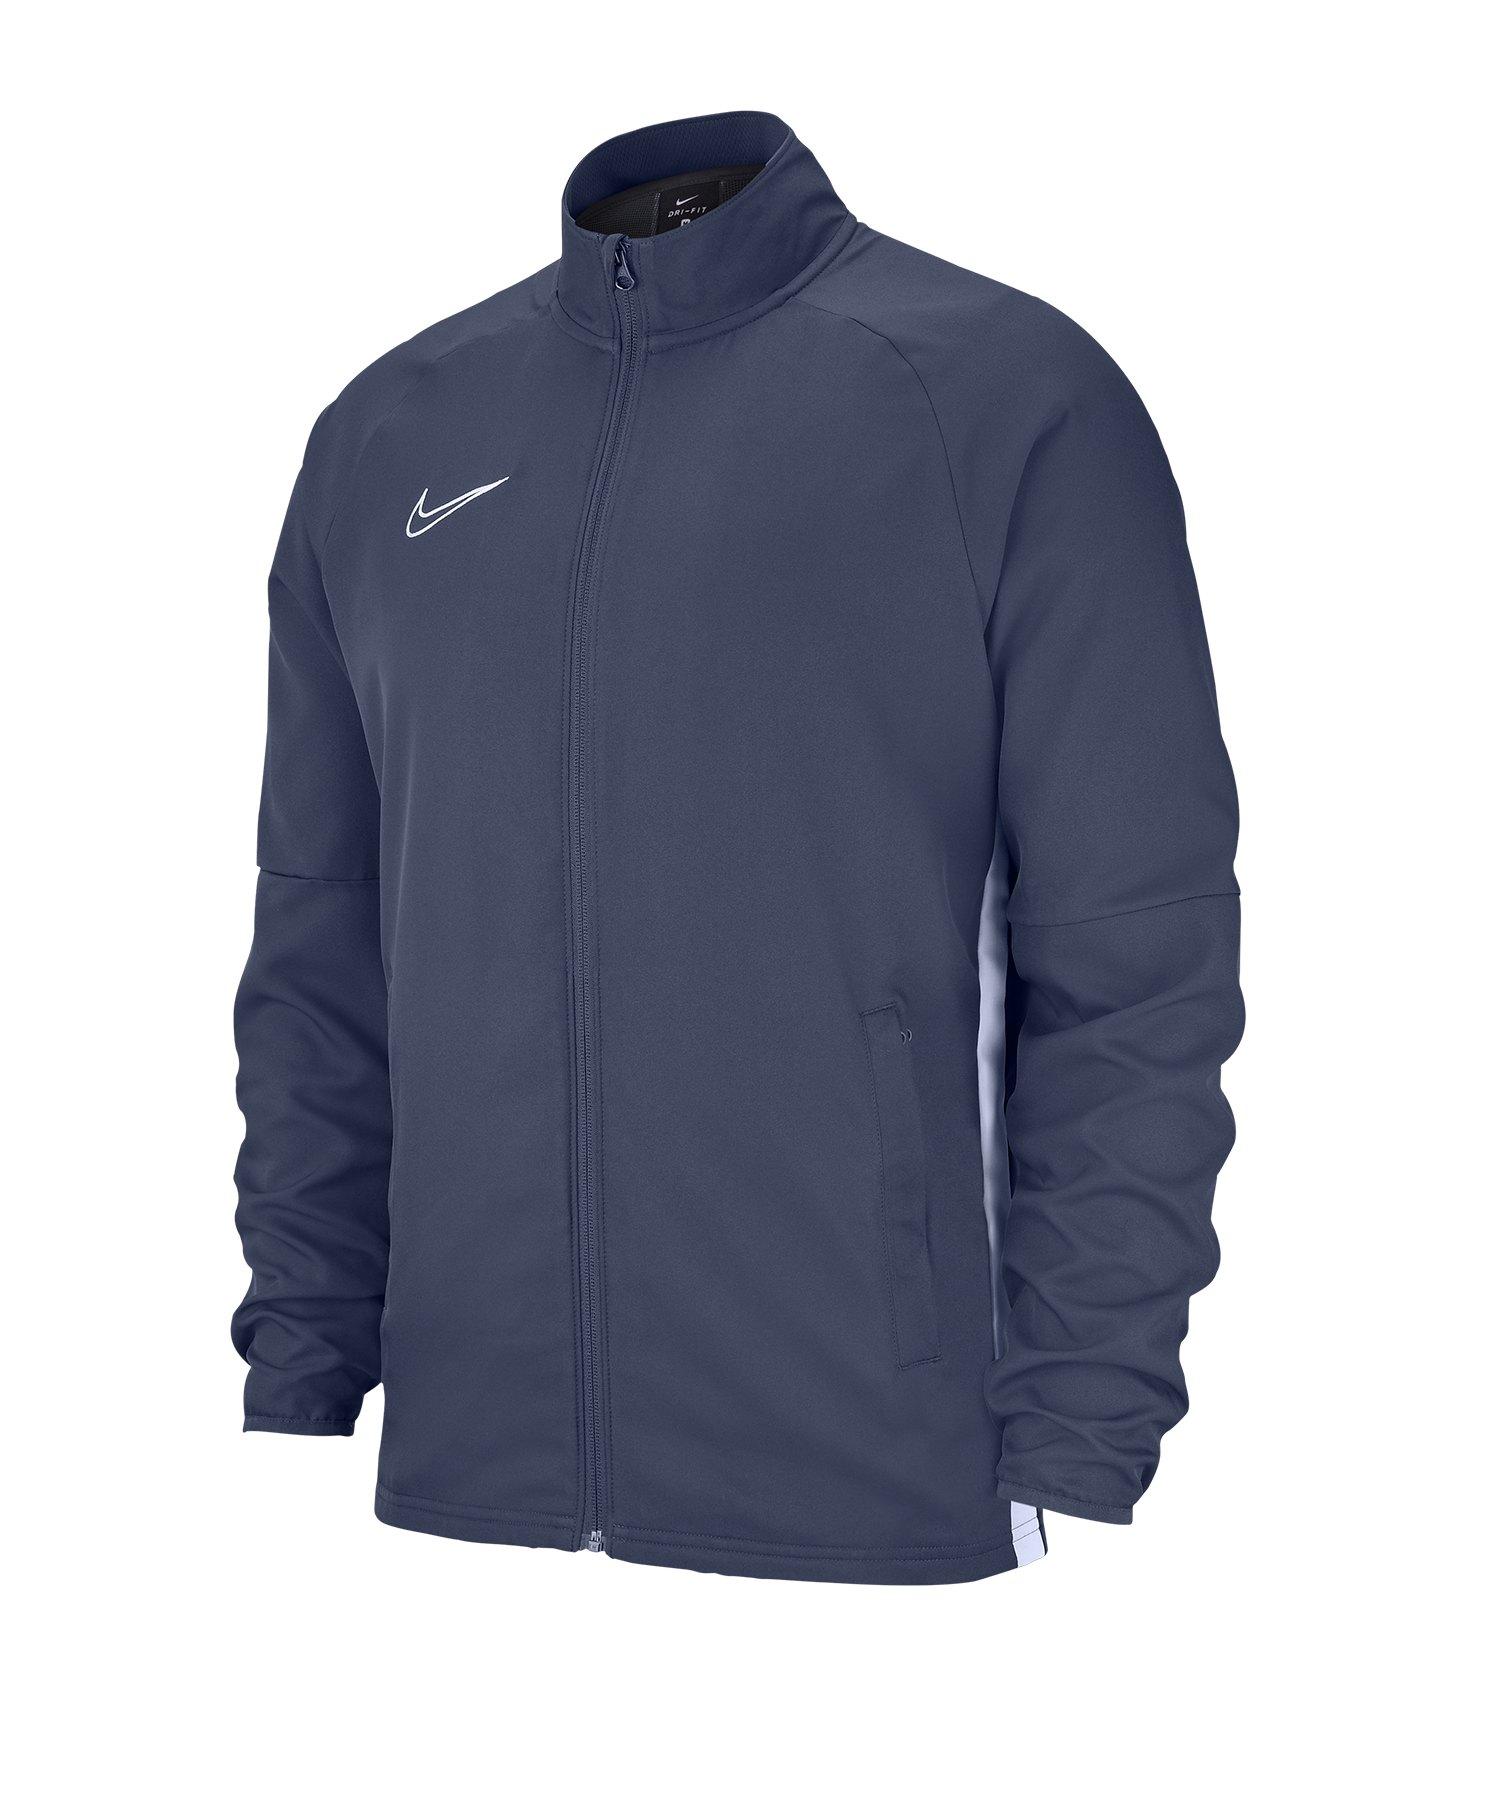 Nike Academy 19 Woven Präsentationsjacke Grau F060 - grau